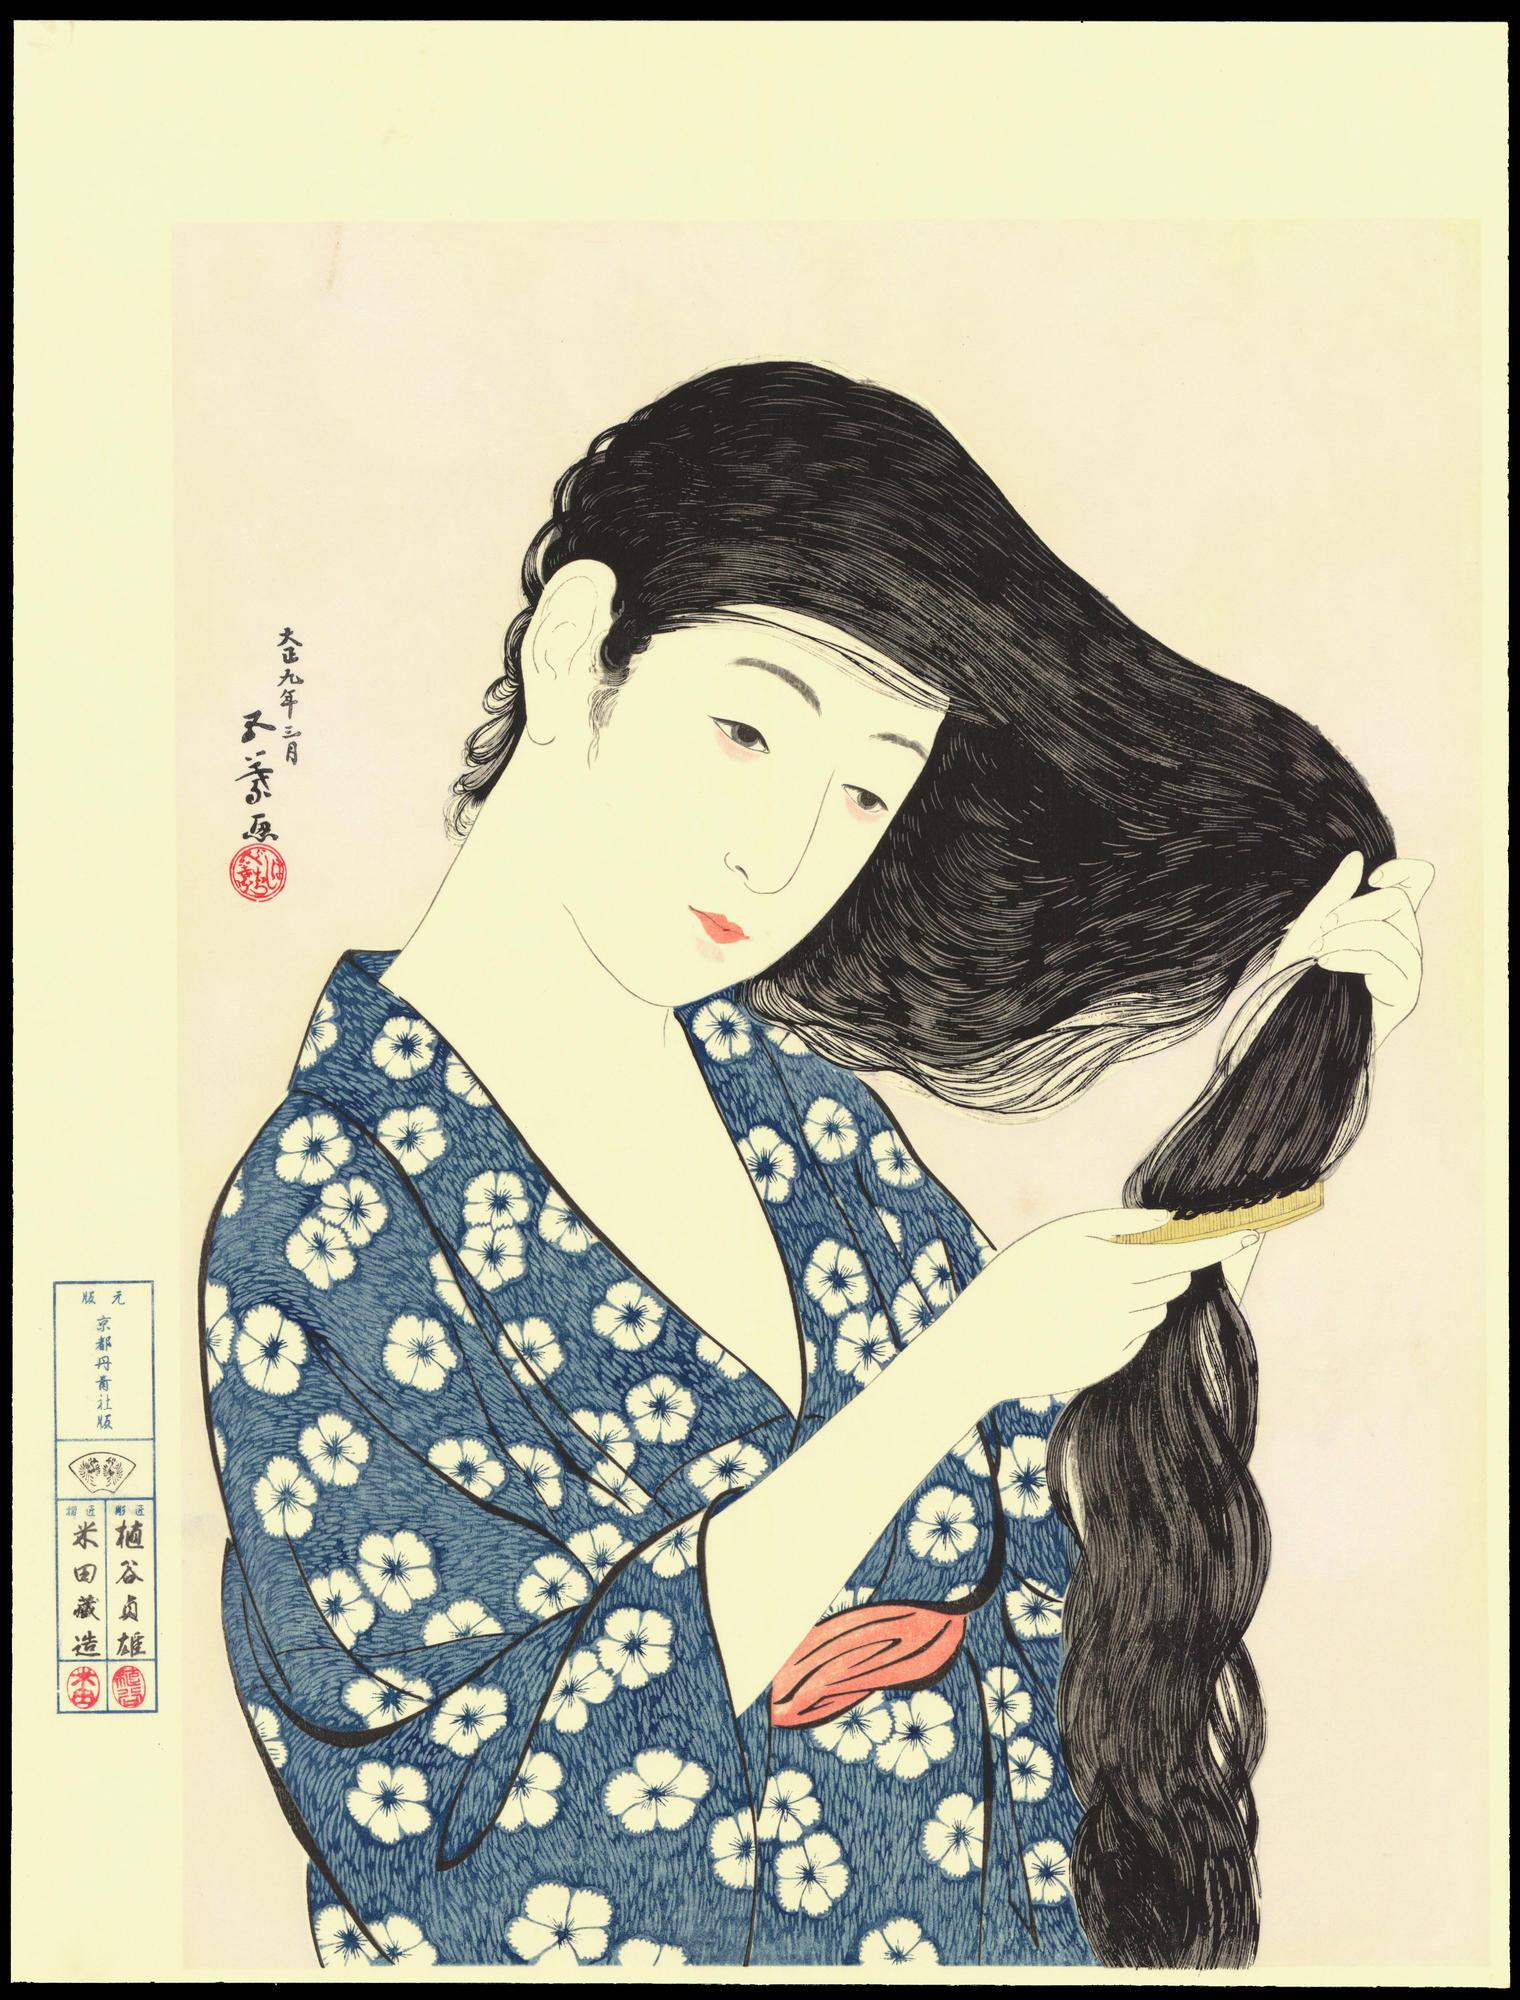 橋口五葉 Woman Combing Her Hair 髪梳ける女 Ohmi Gallery 浮世絵検索